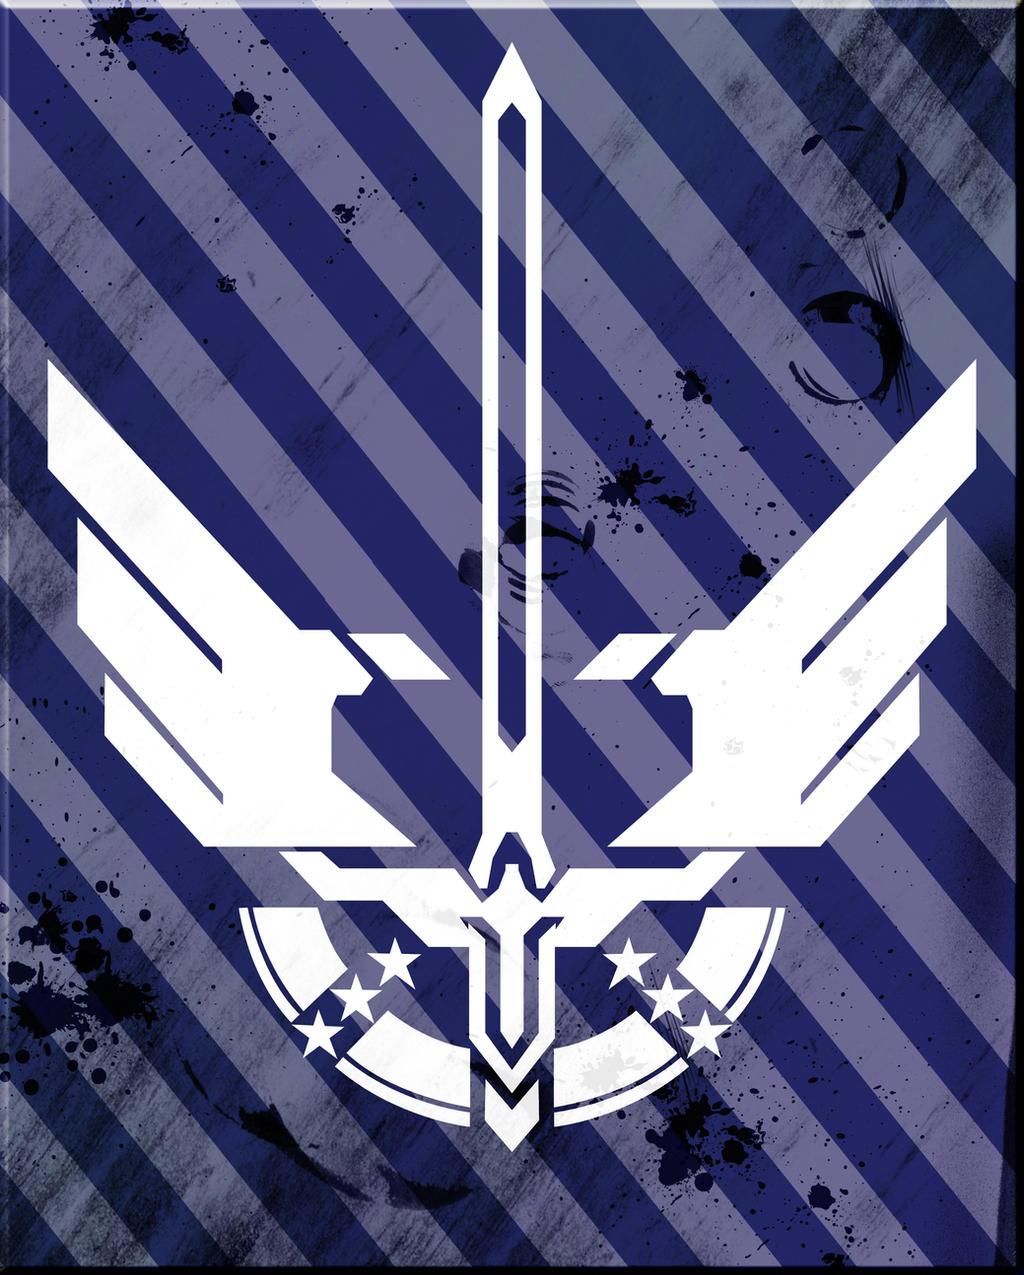 halo 4 sword armor logo by nemesis01 on deviantart